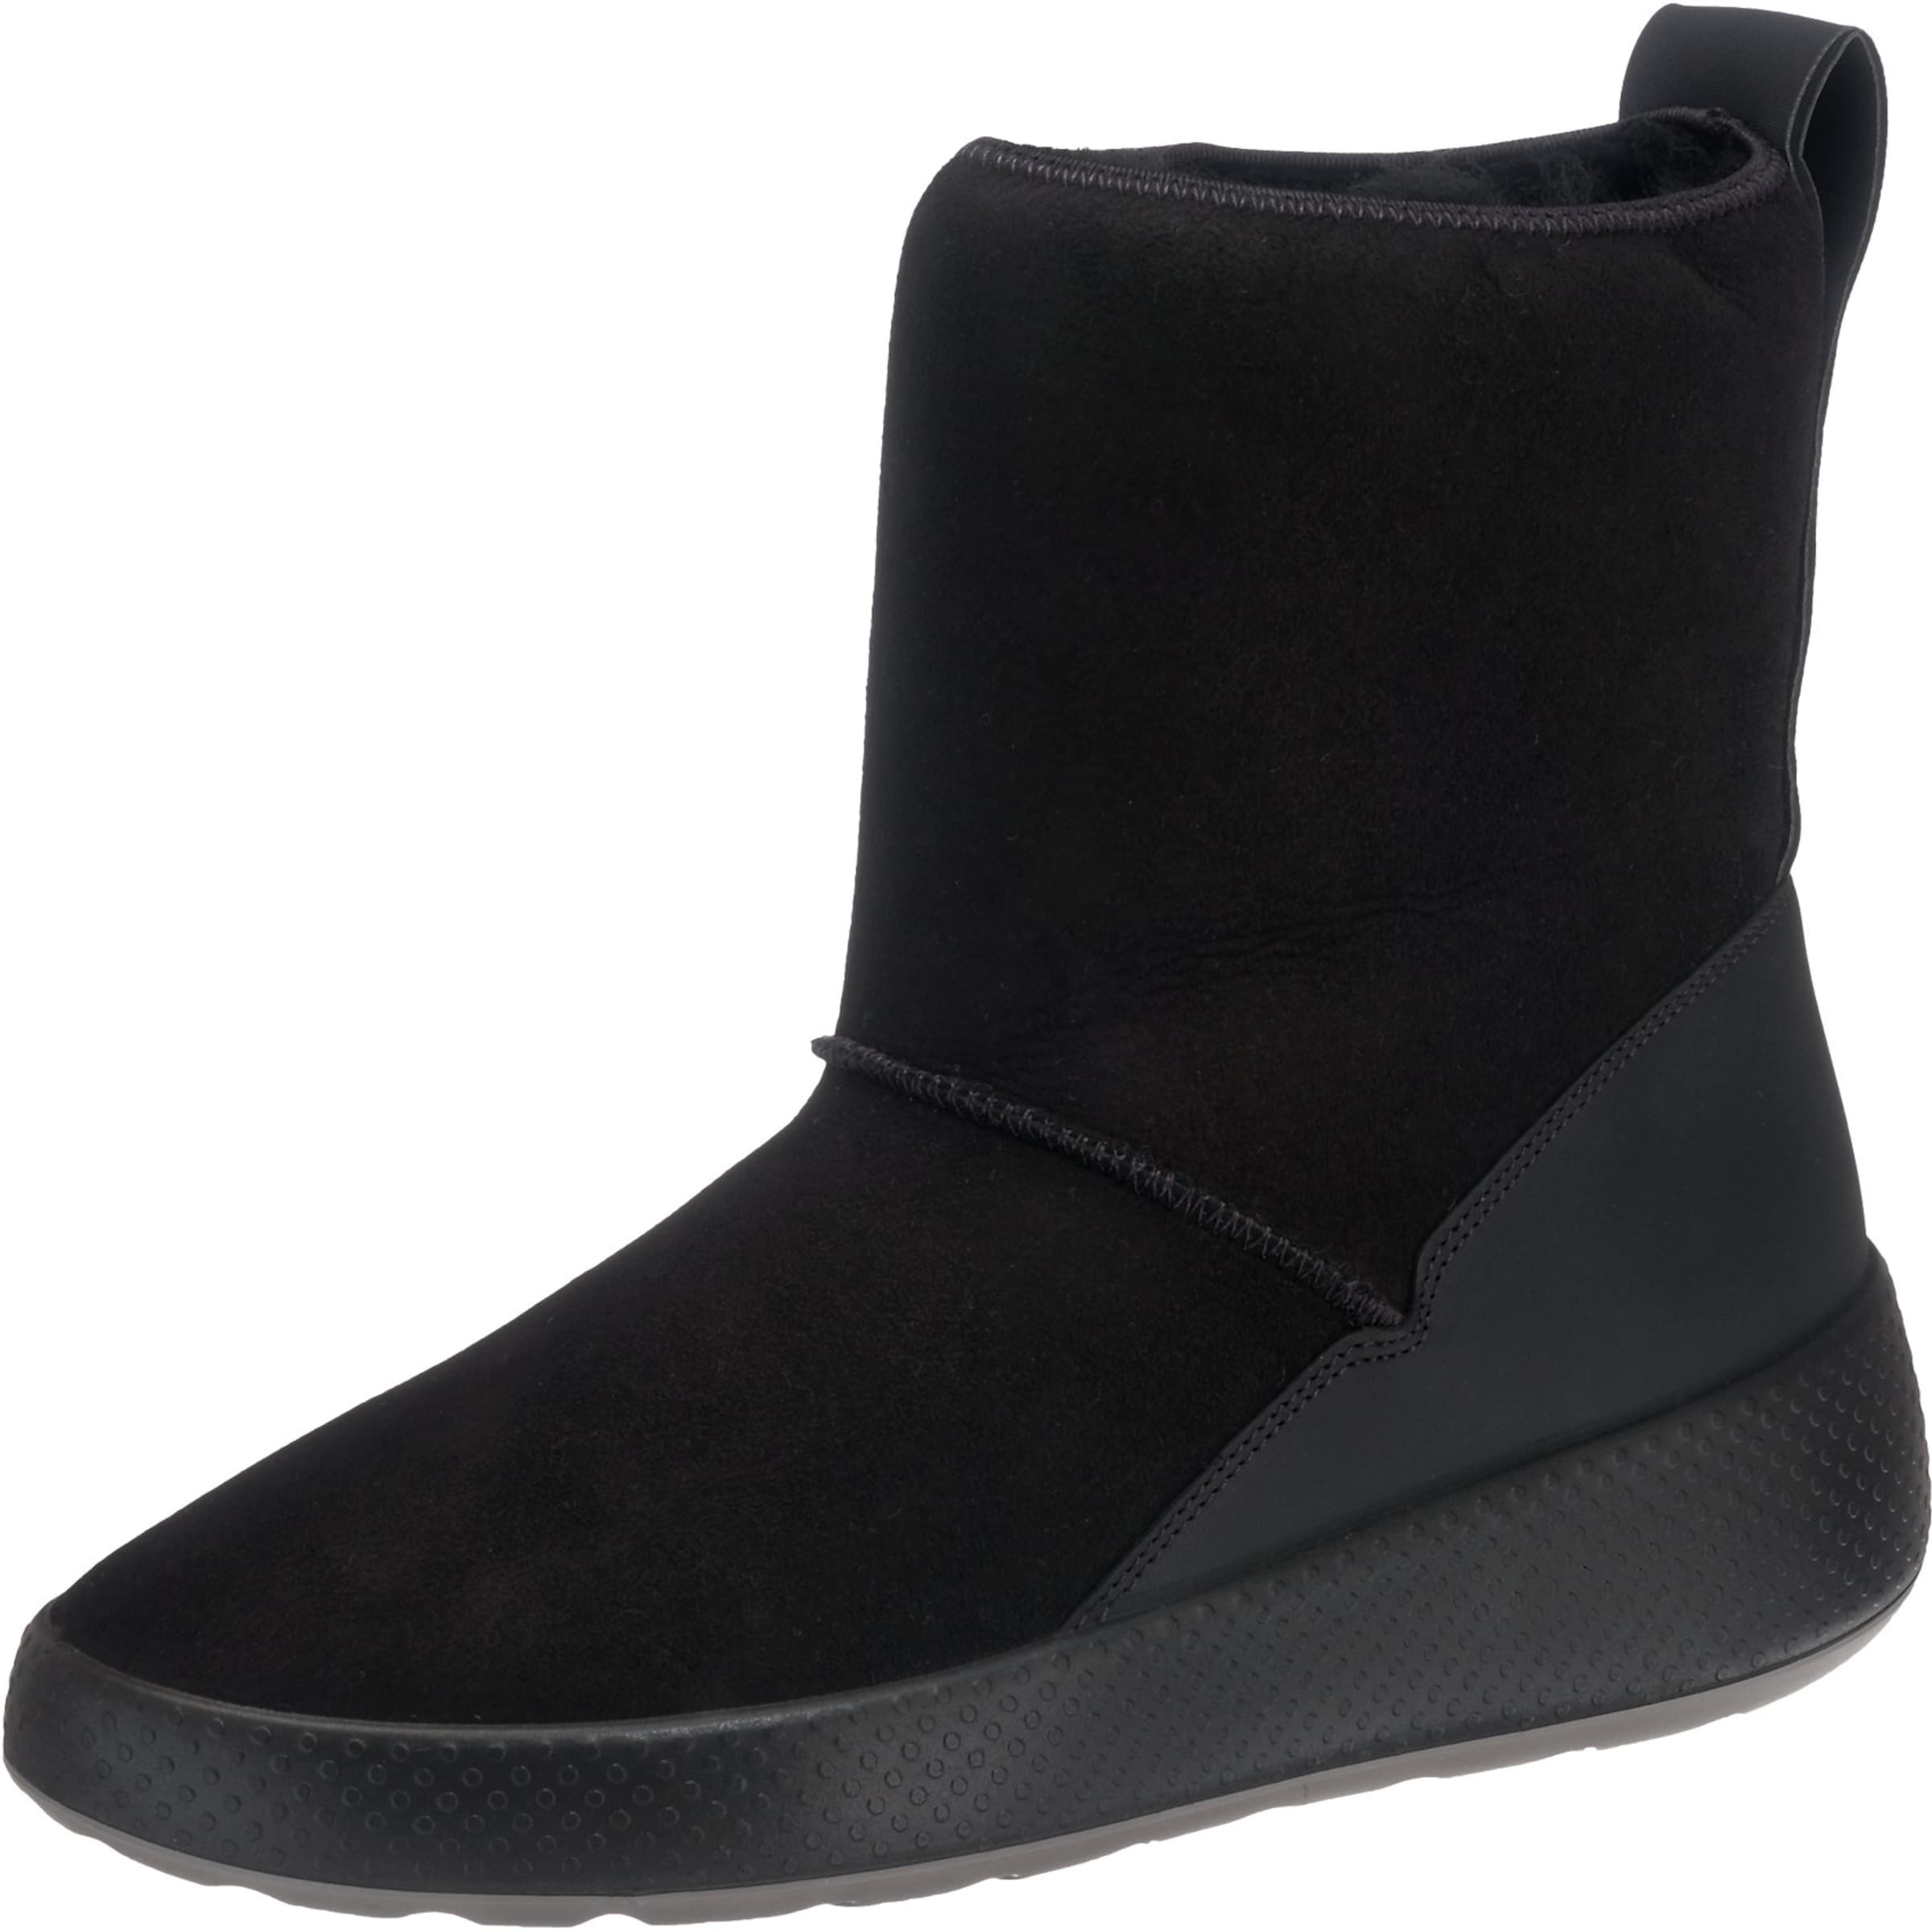 ECCO Stiefel 'Ukiuk' in schwarz